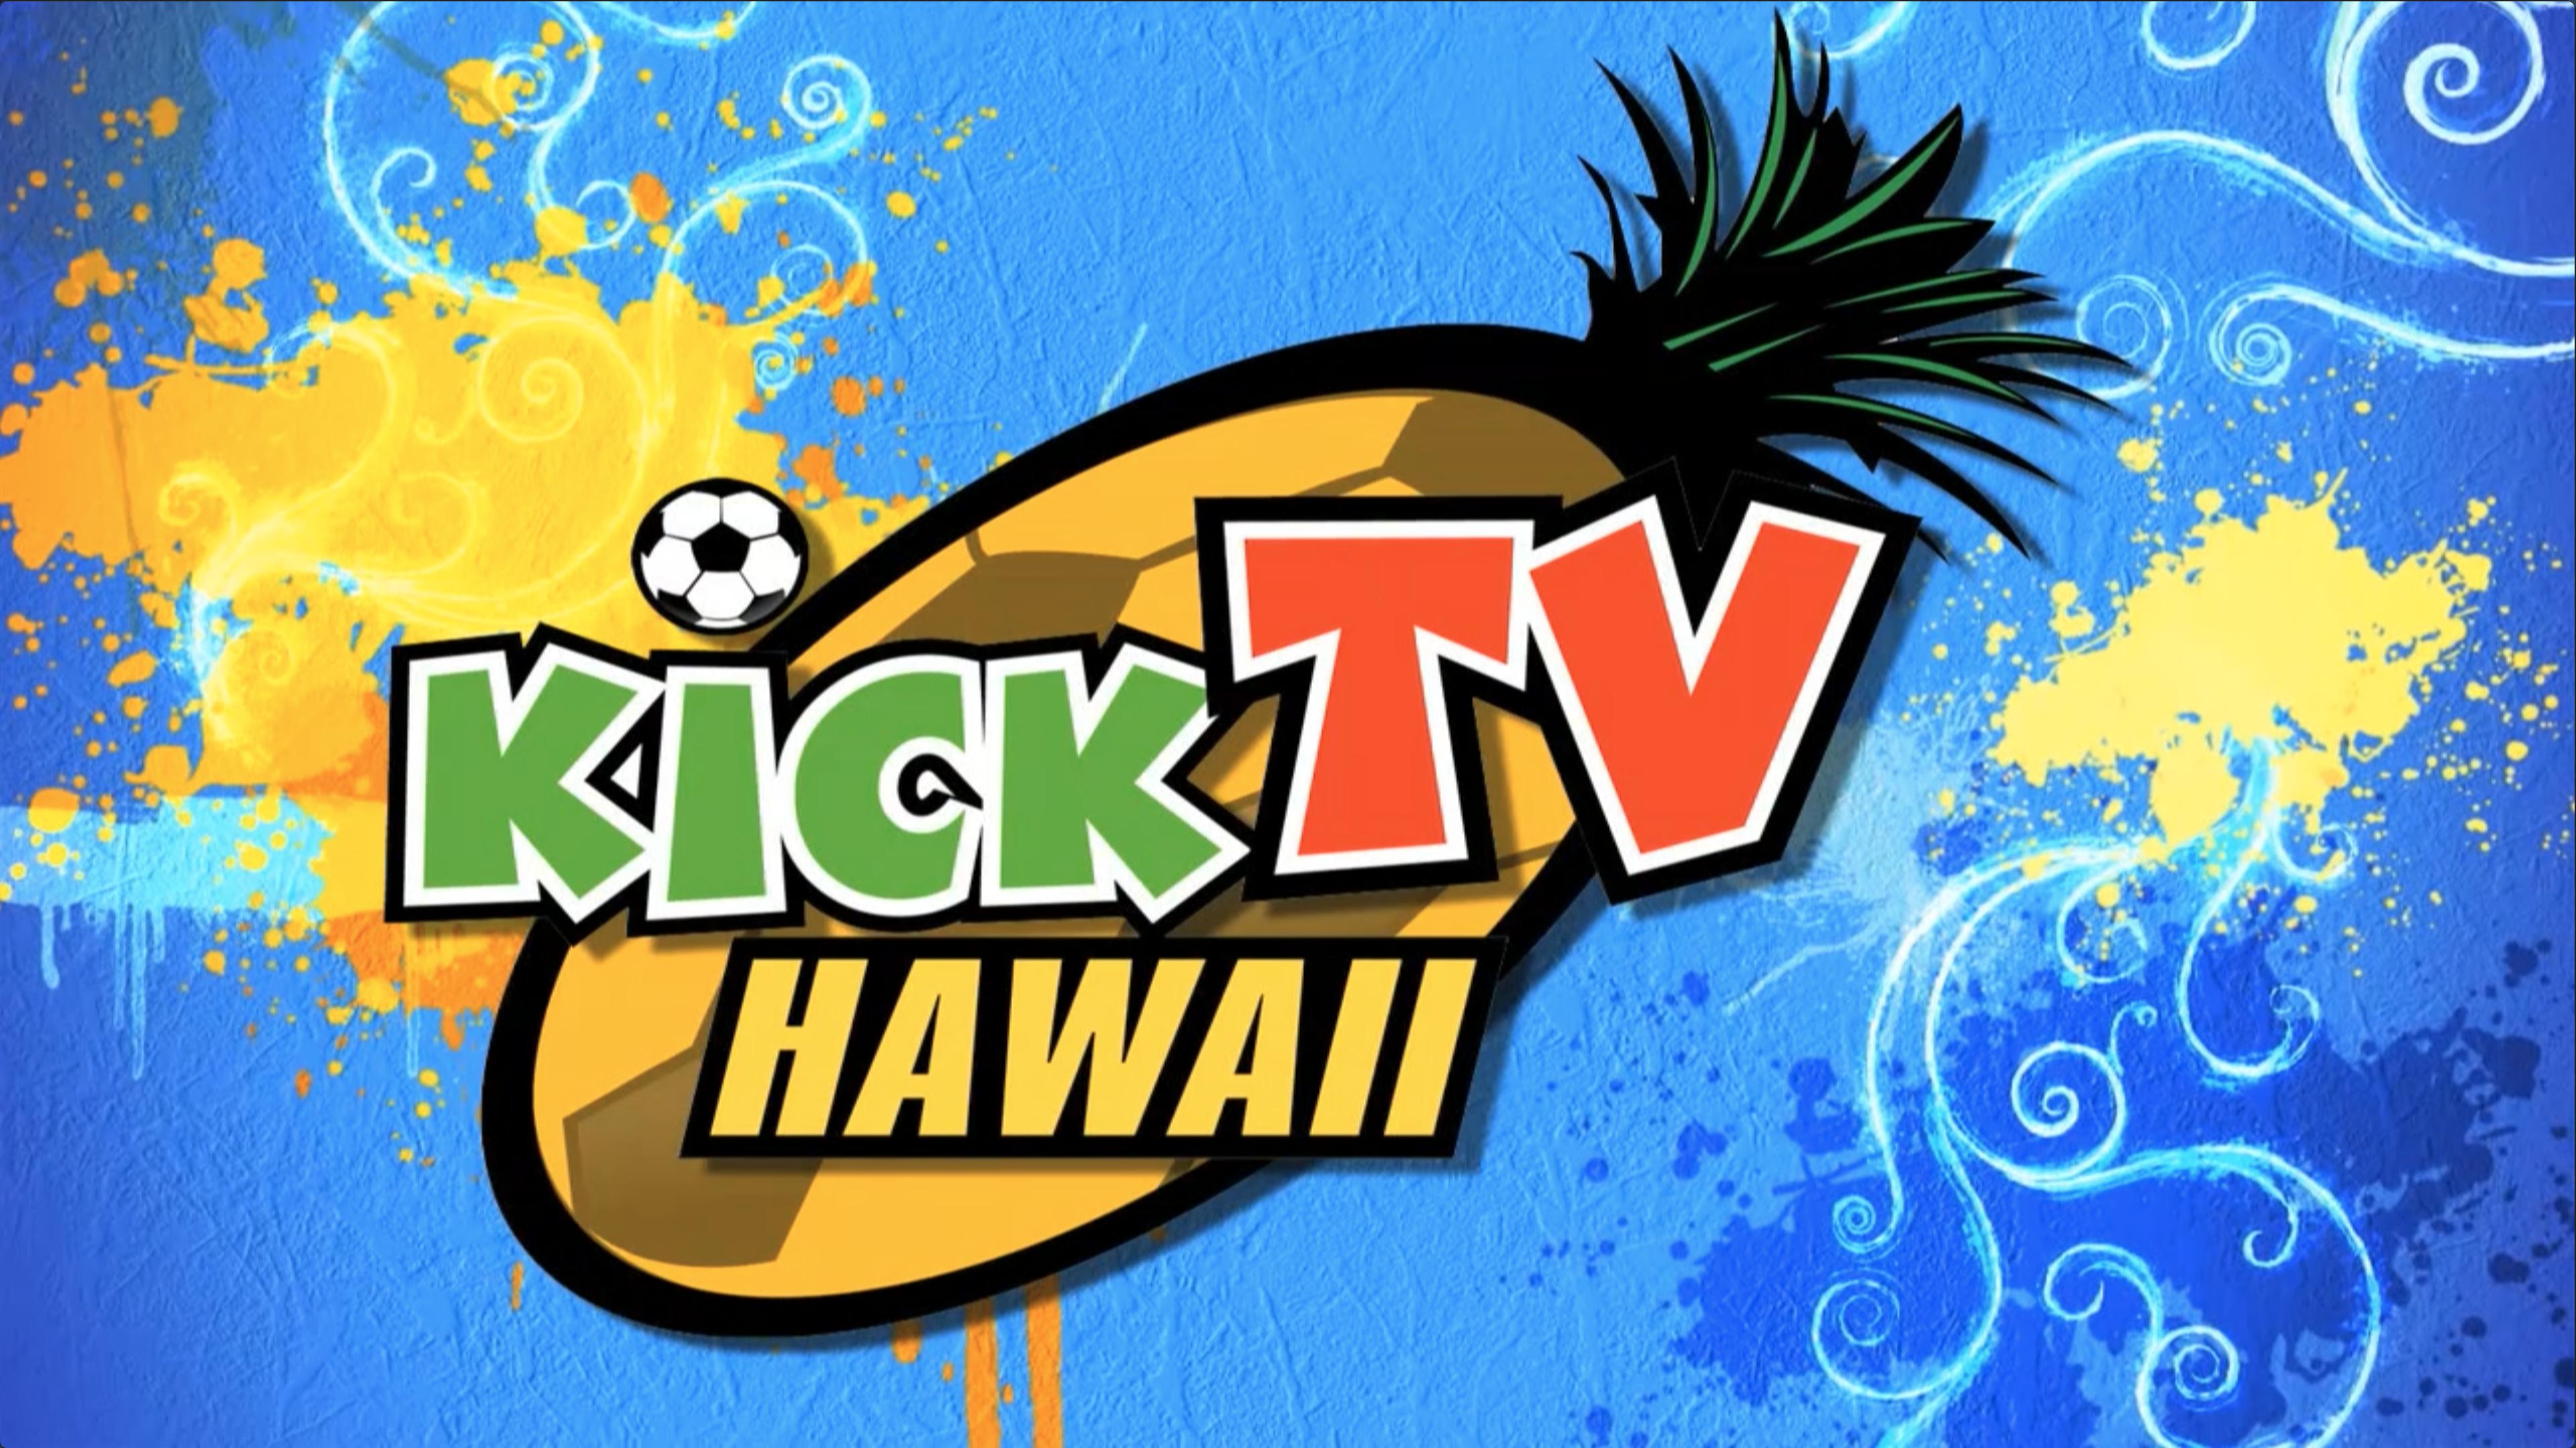 KICK TV 1